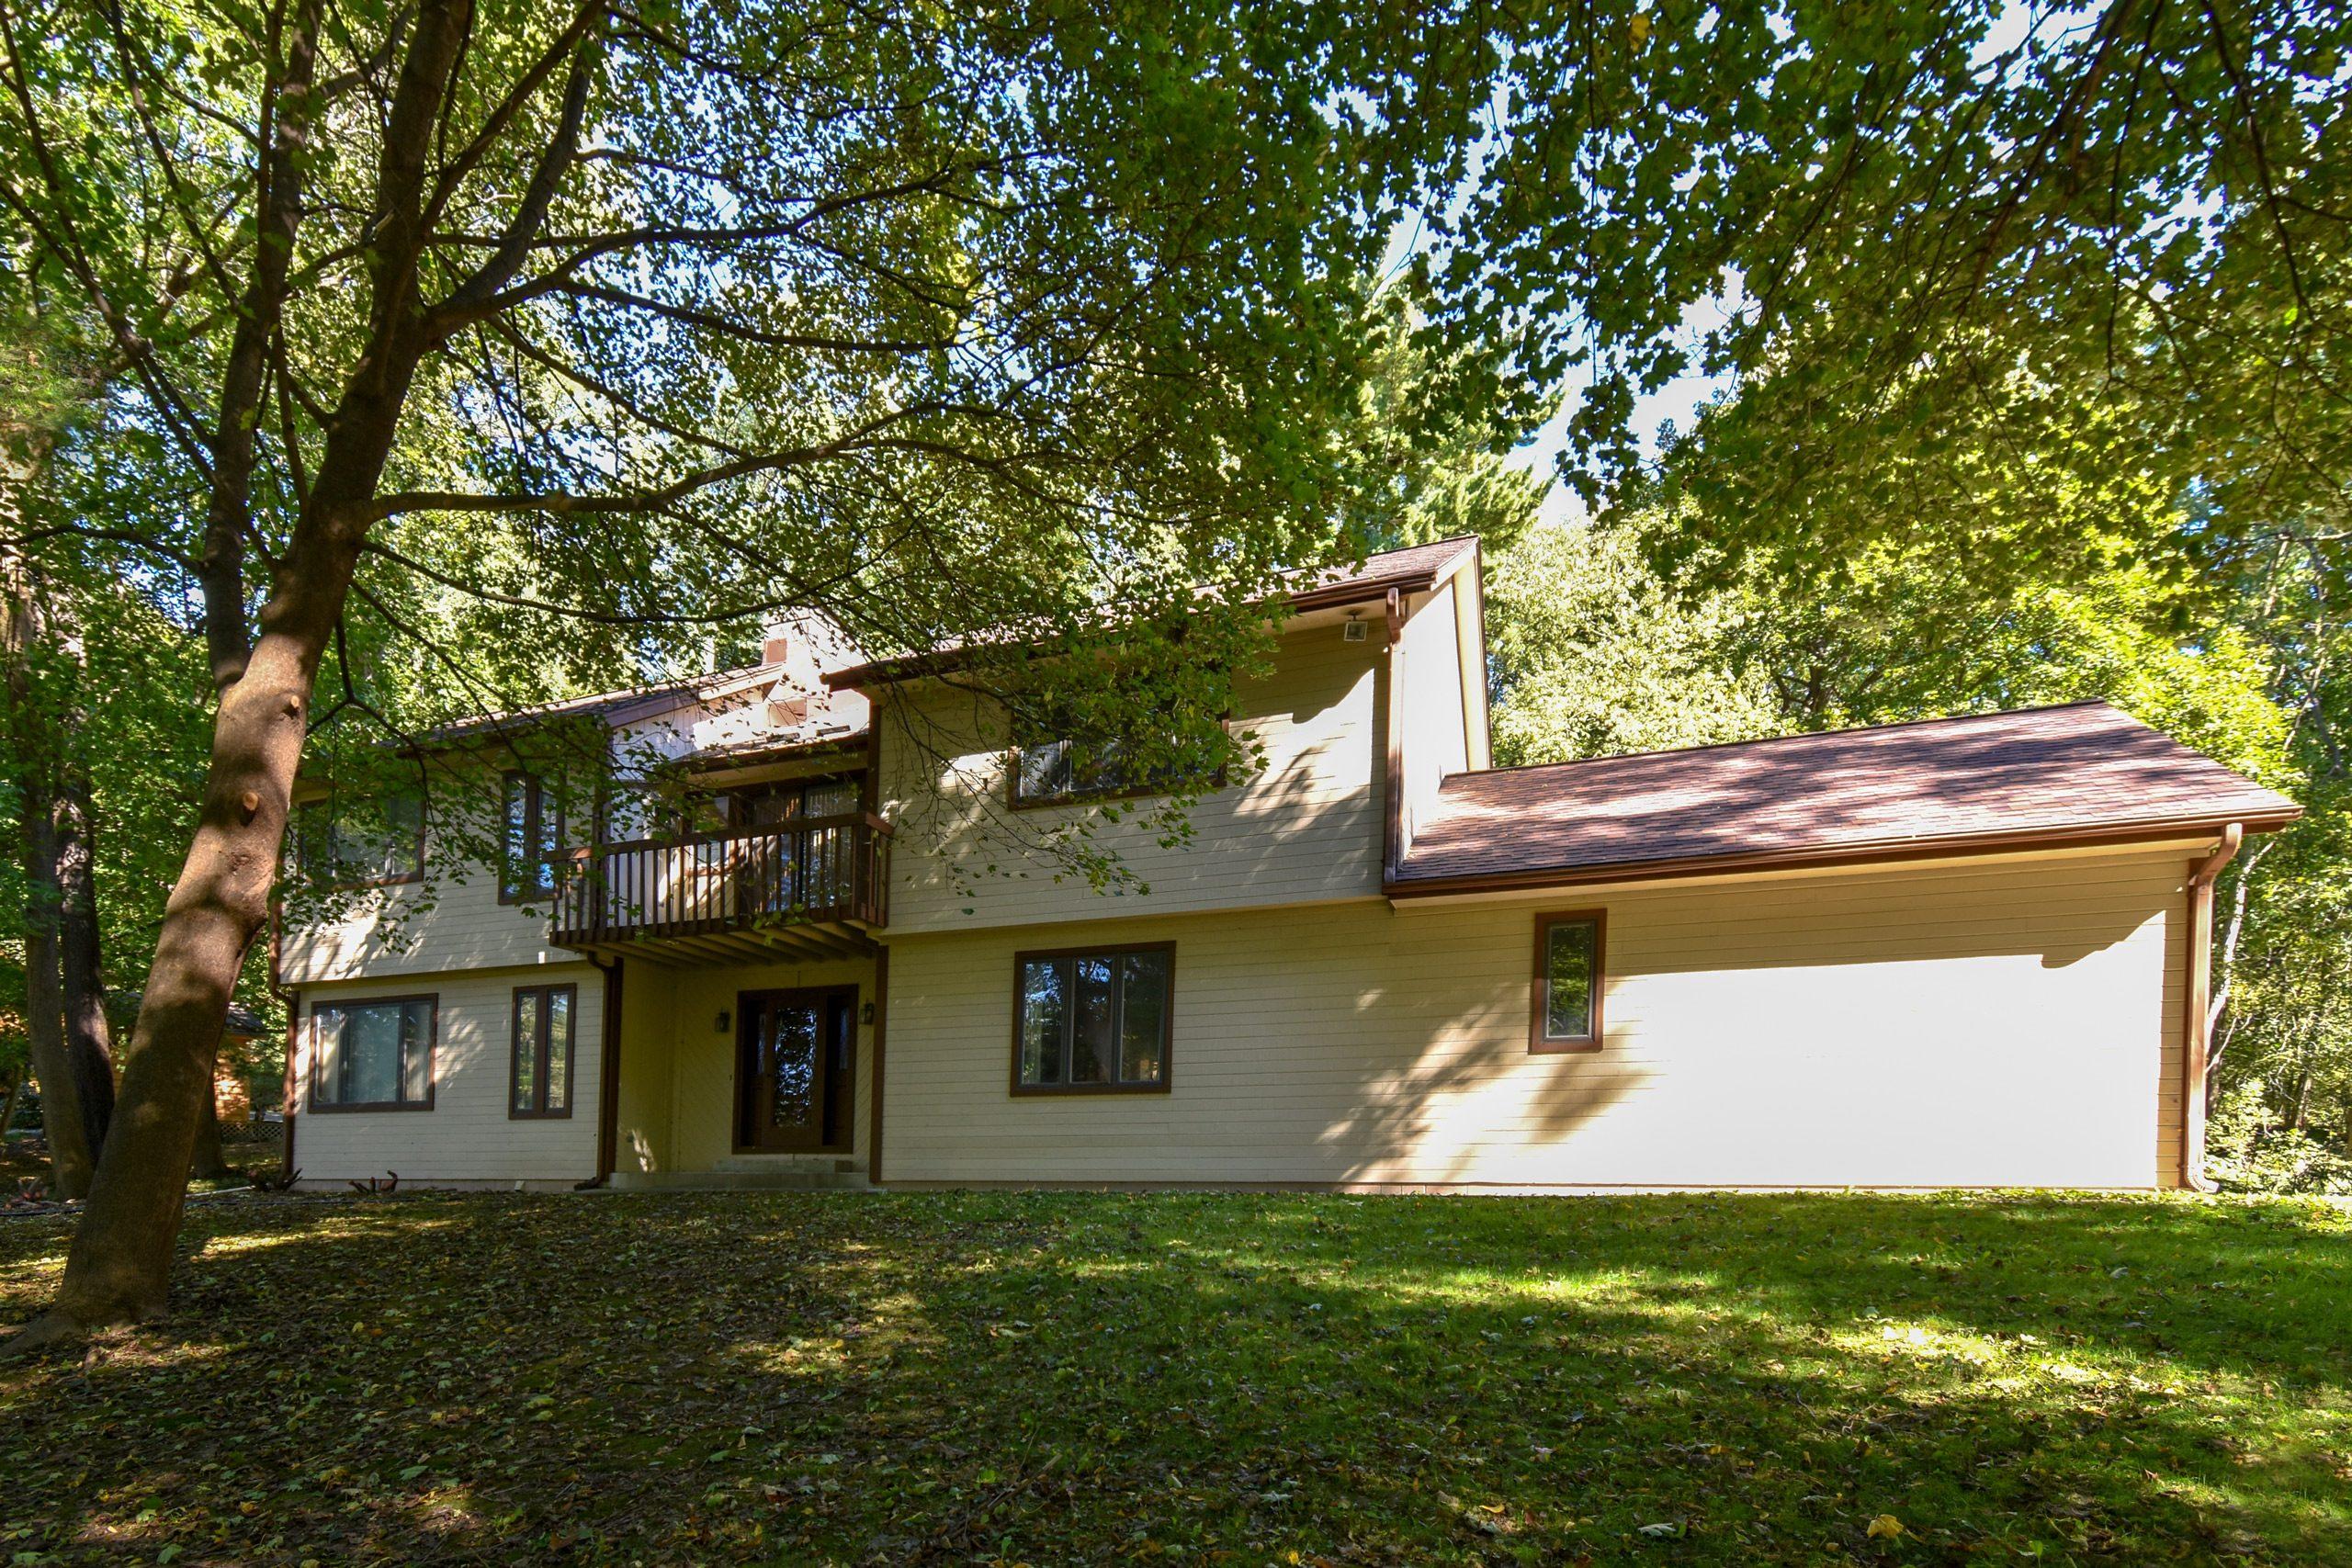 Kowalske-delafield-house-exterior